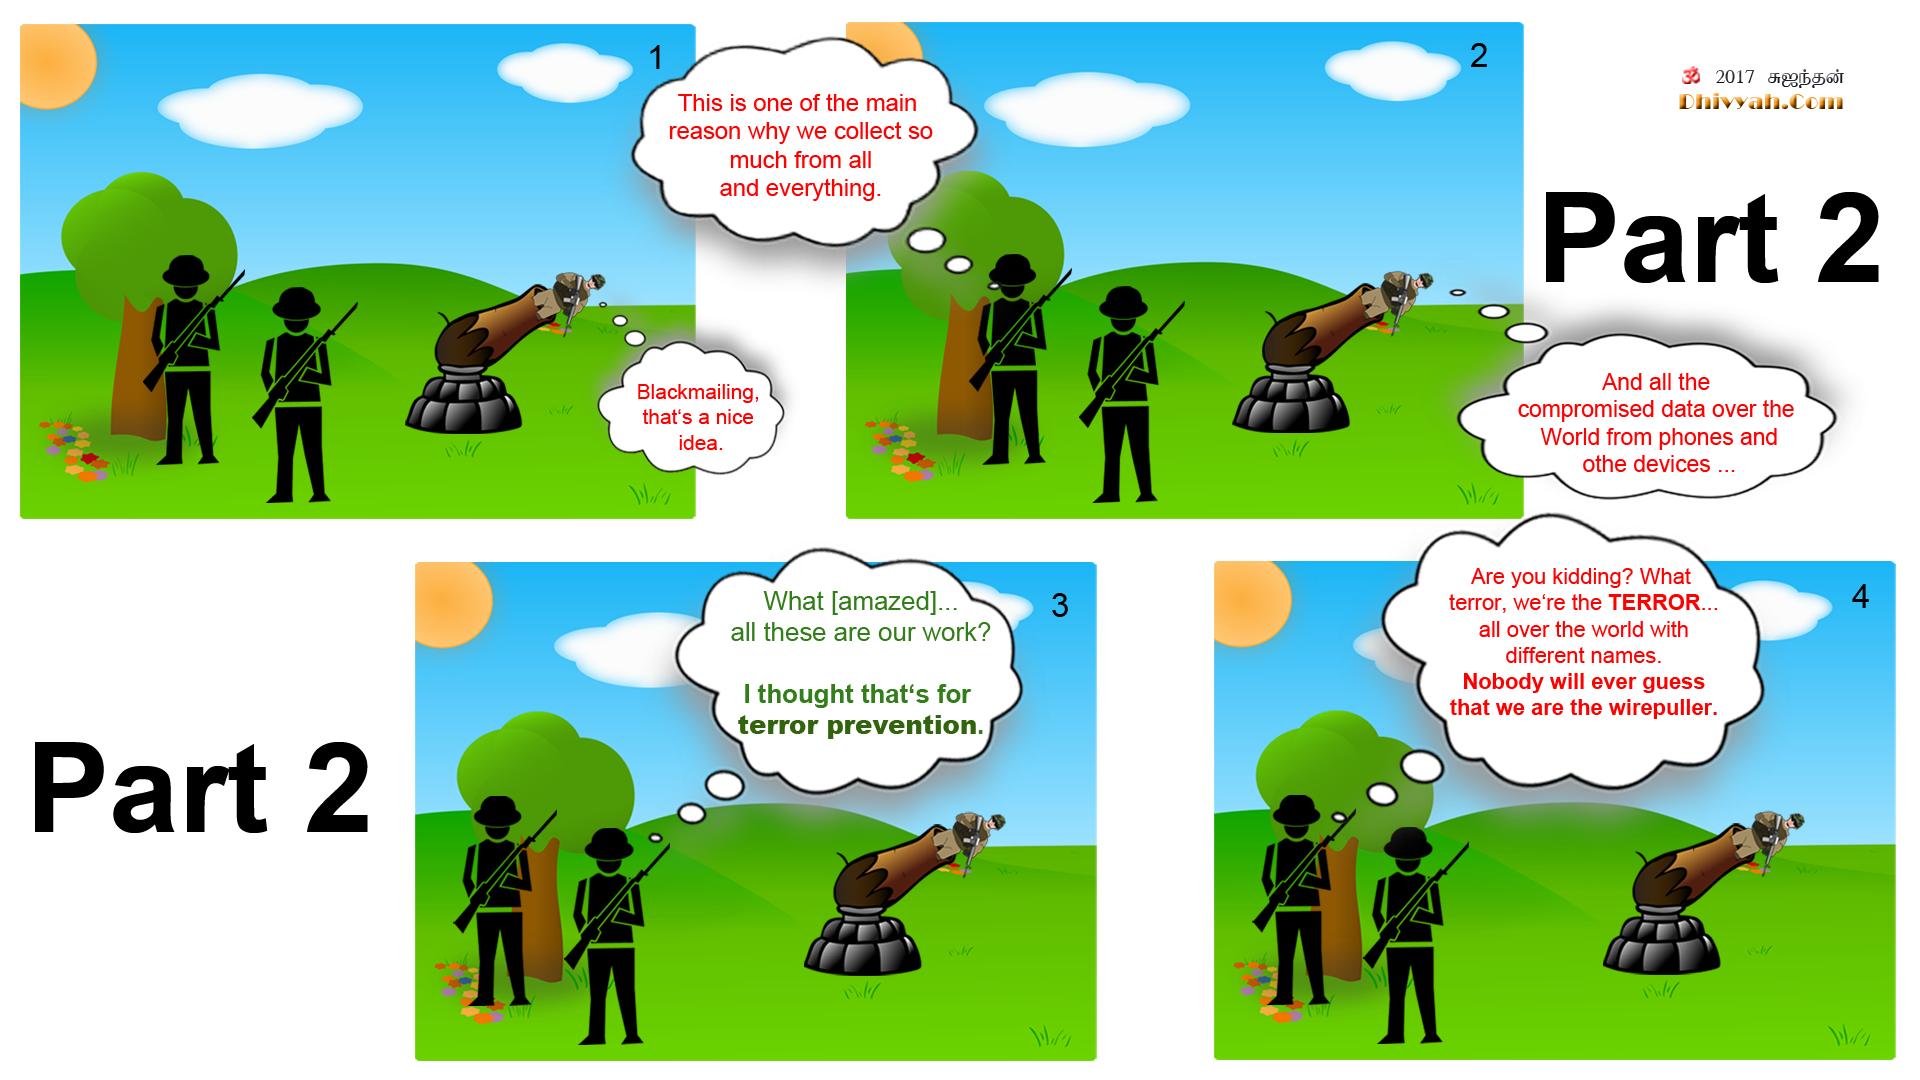 Cannon fodder - Part 2